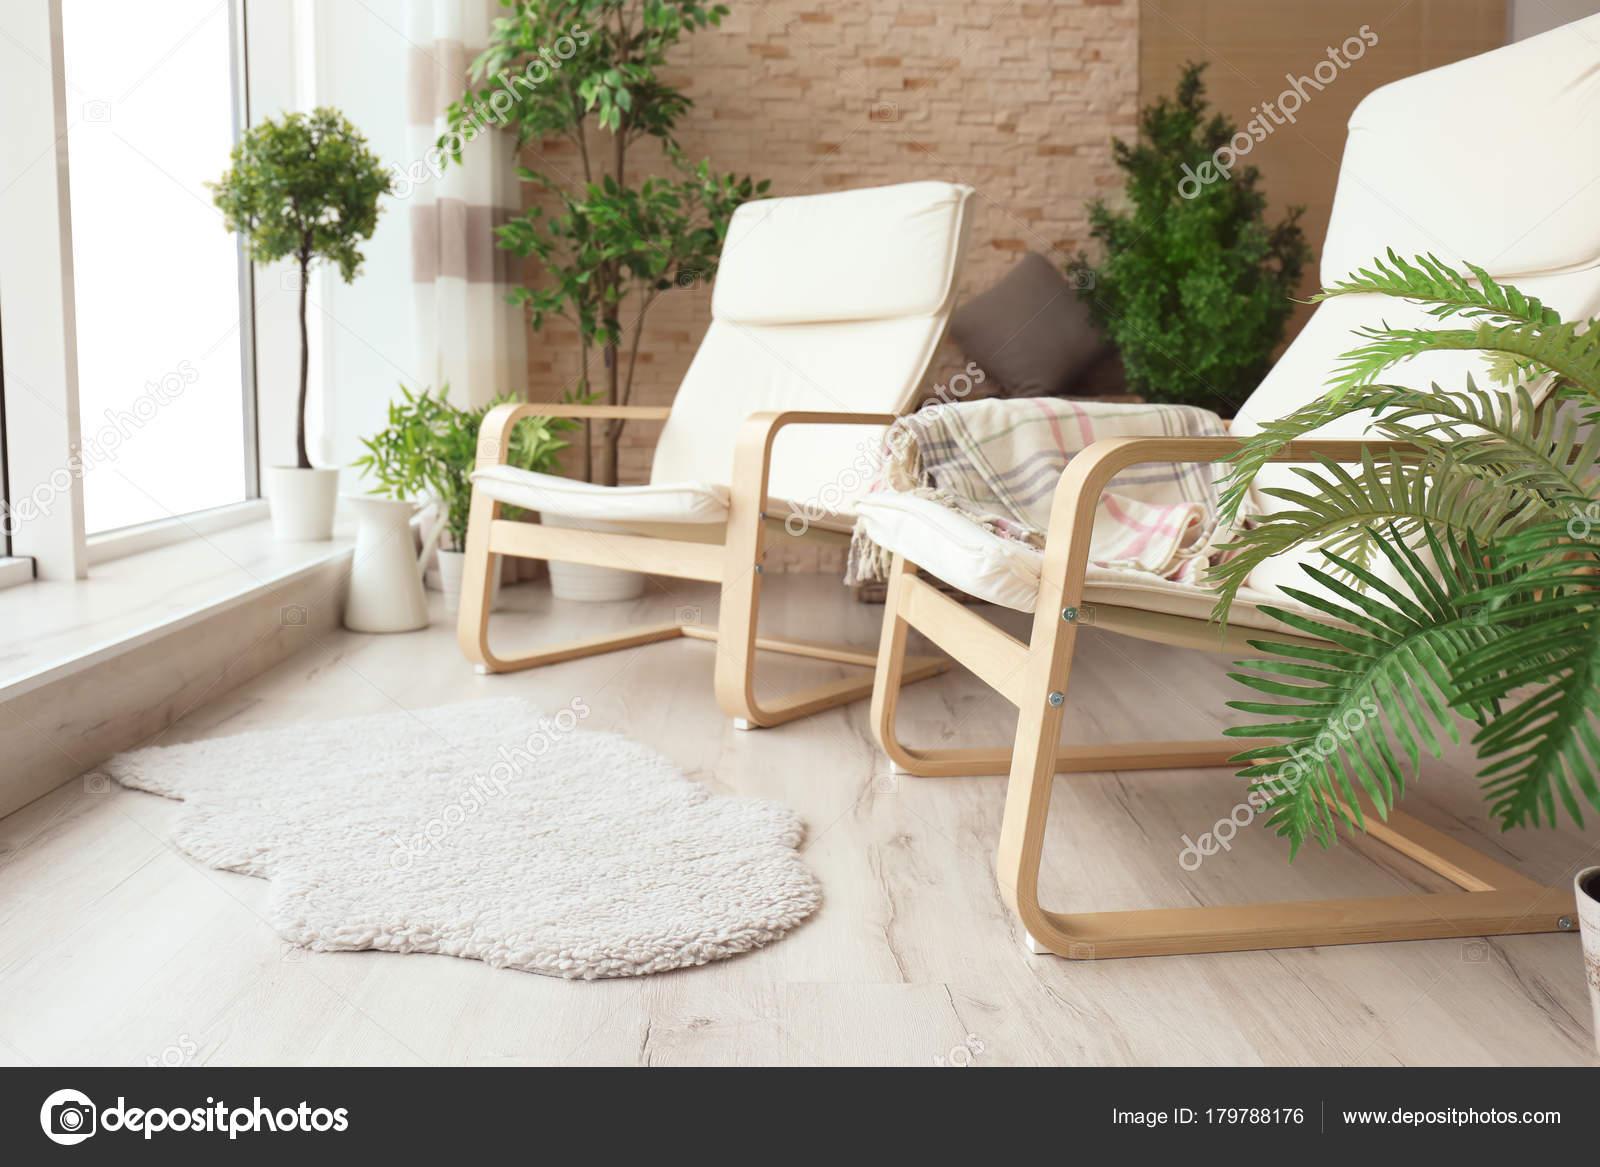 Bequeme Sessel Moderne Wohnzimmer Stockfoto C Belchonock 179788176